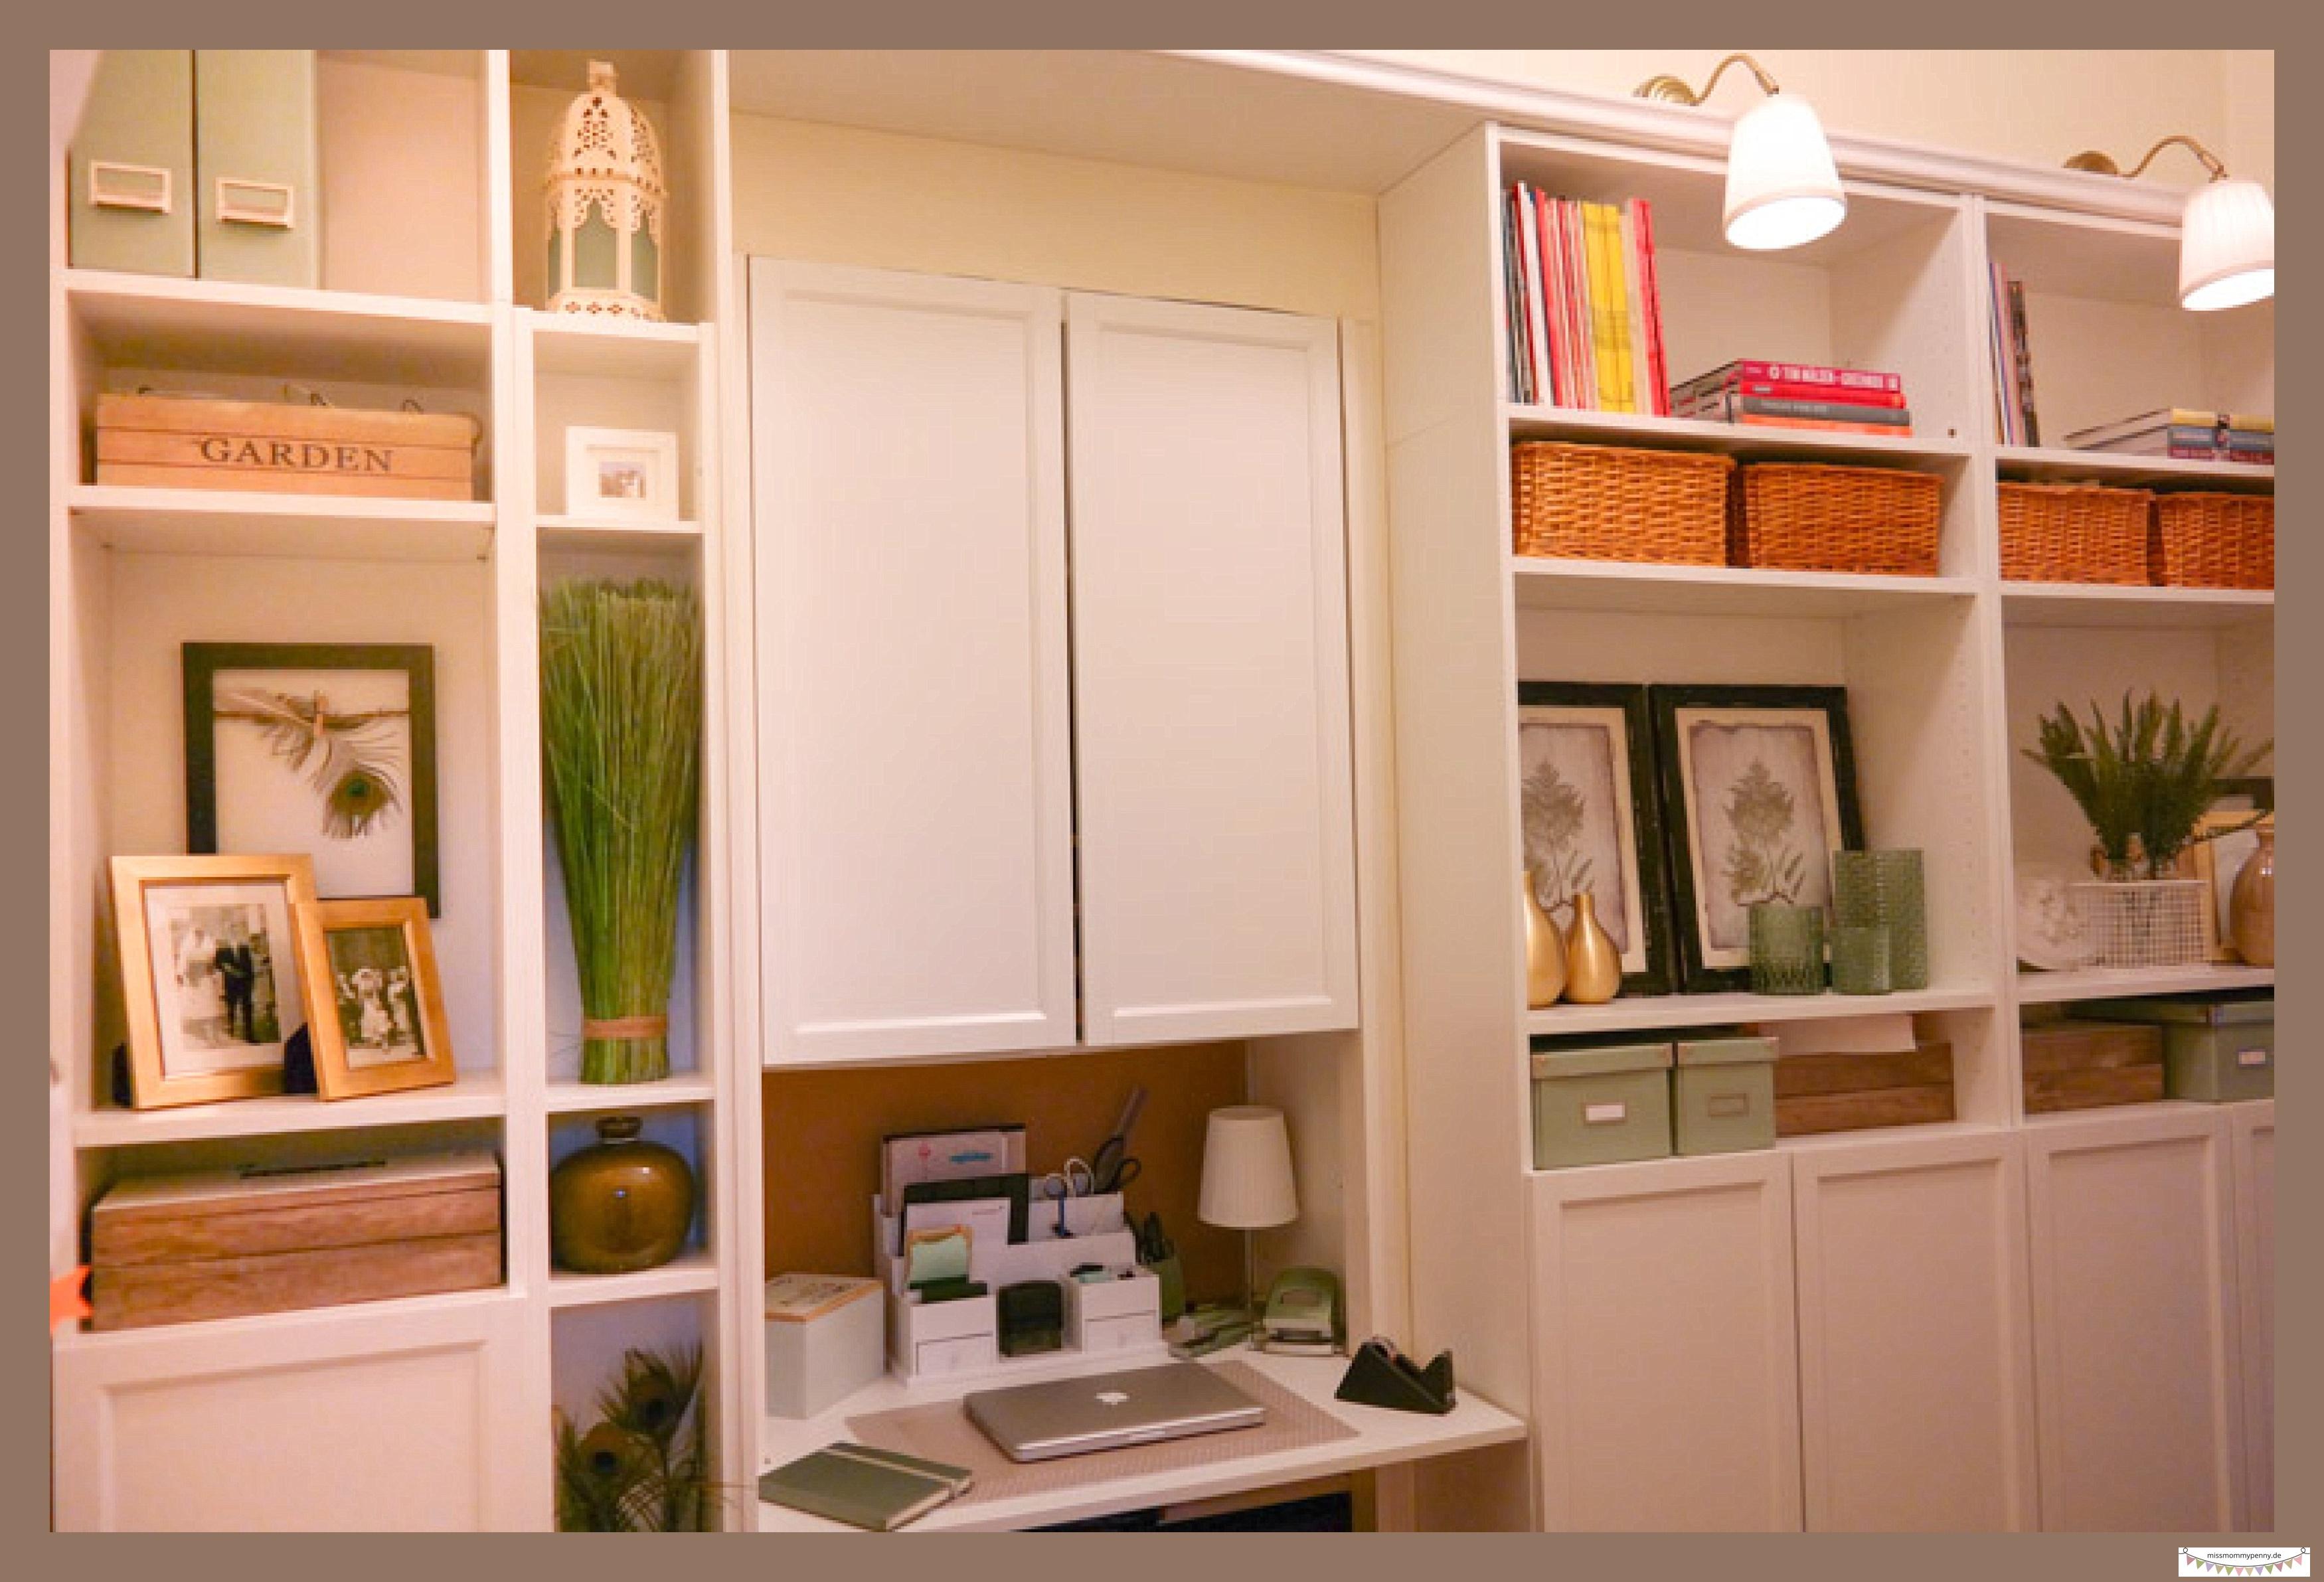 smarte wohnl sungen archive missmommypenny. Black Bedroom Furniture Sets. Home Design Ideas